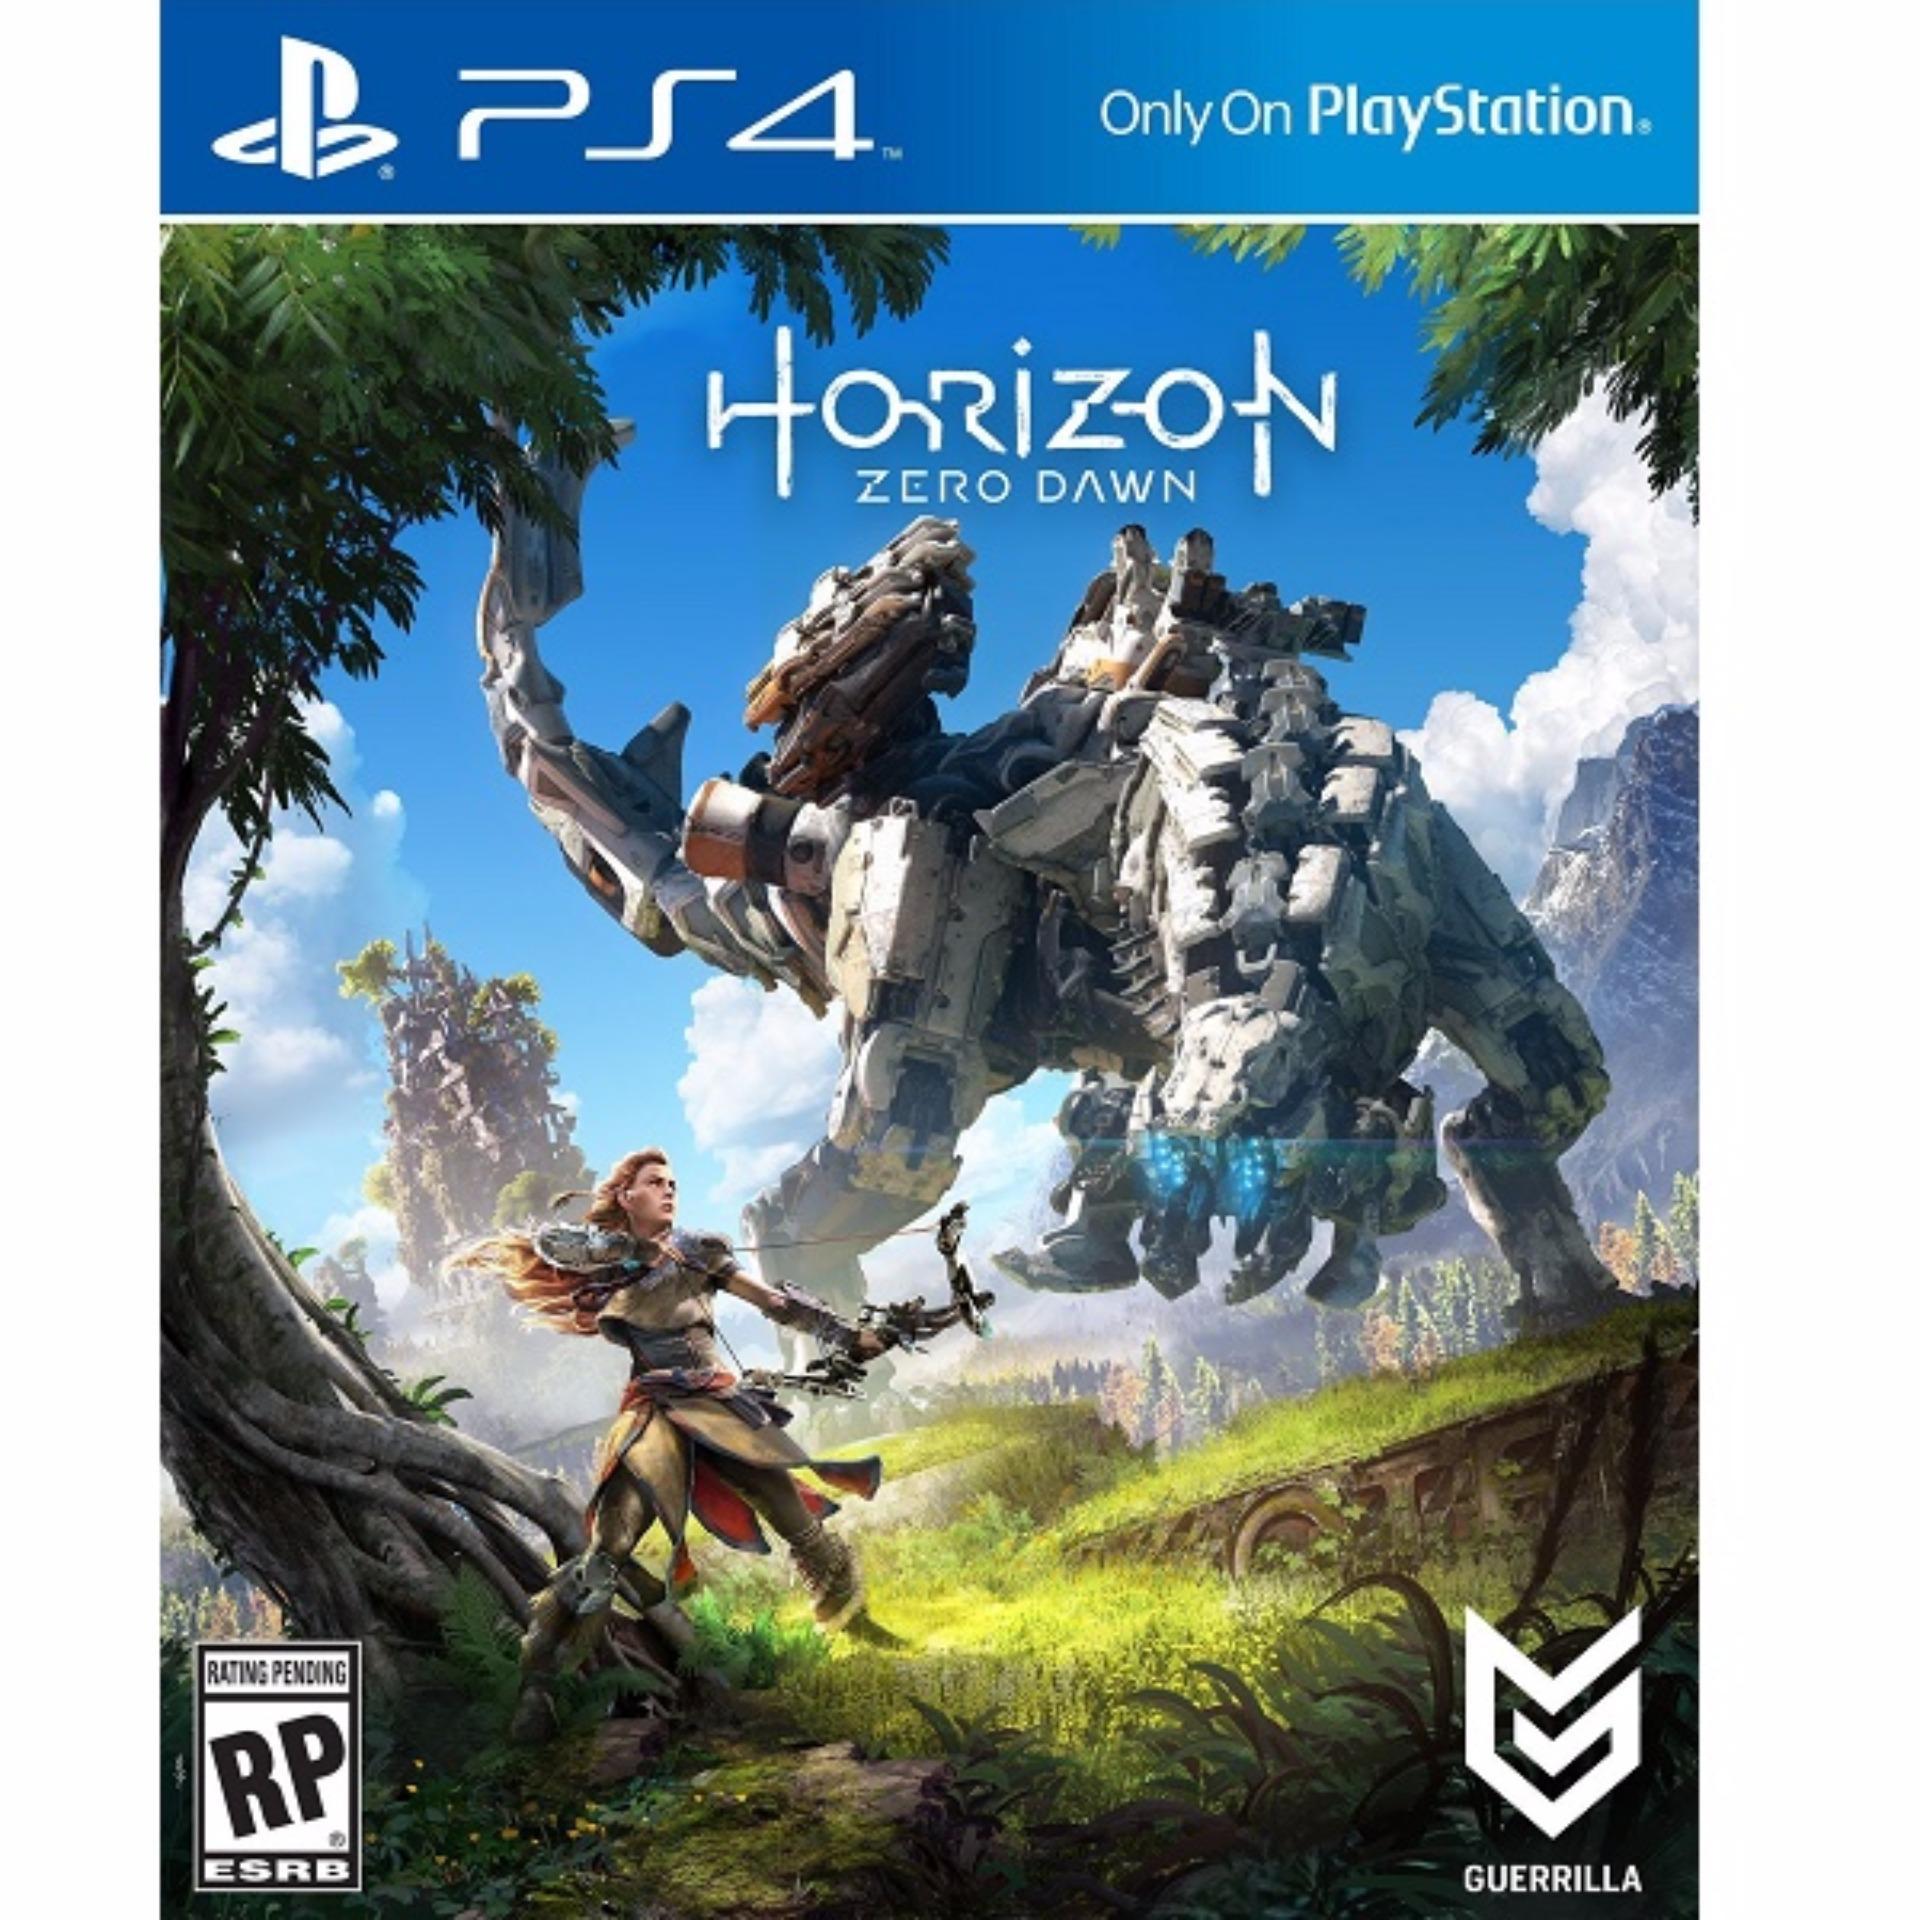 PS4 Horizon Zero Dawn(Blue)